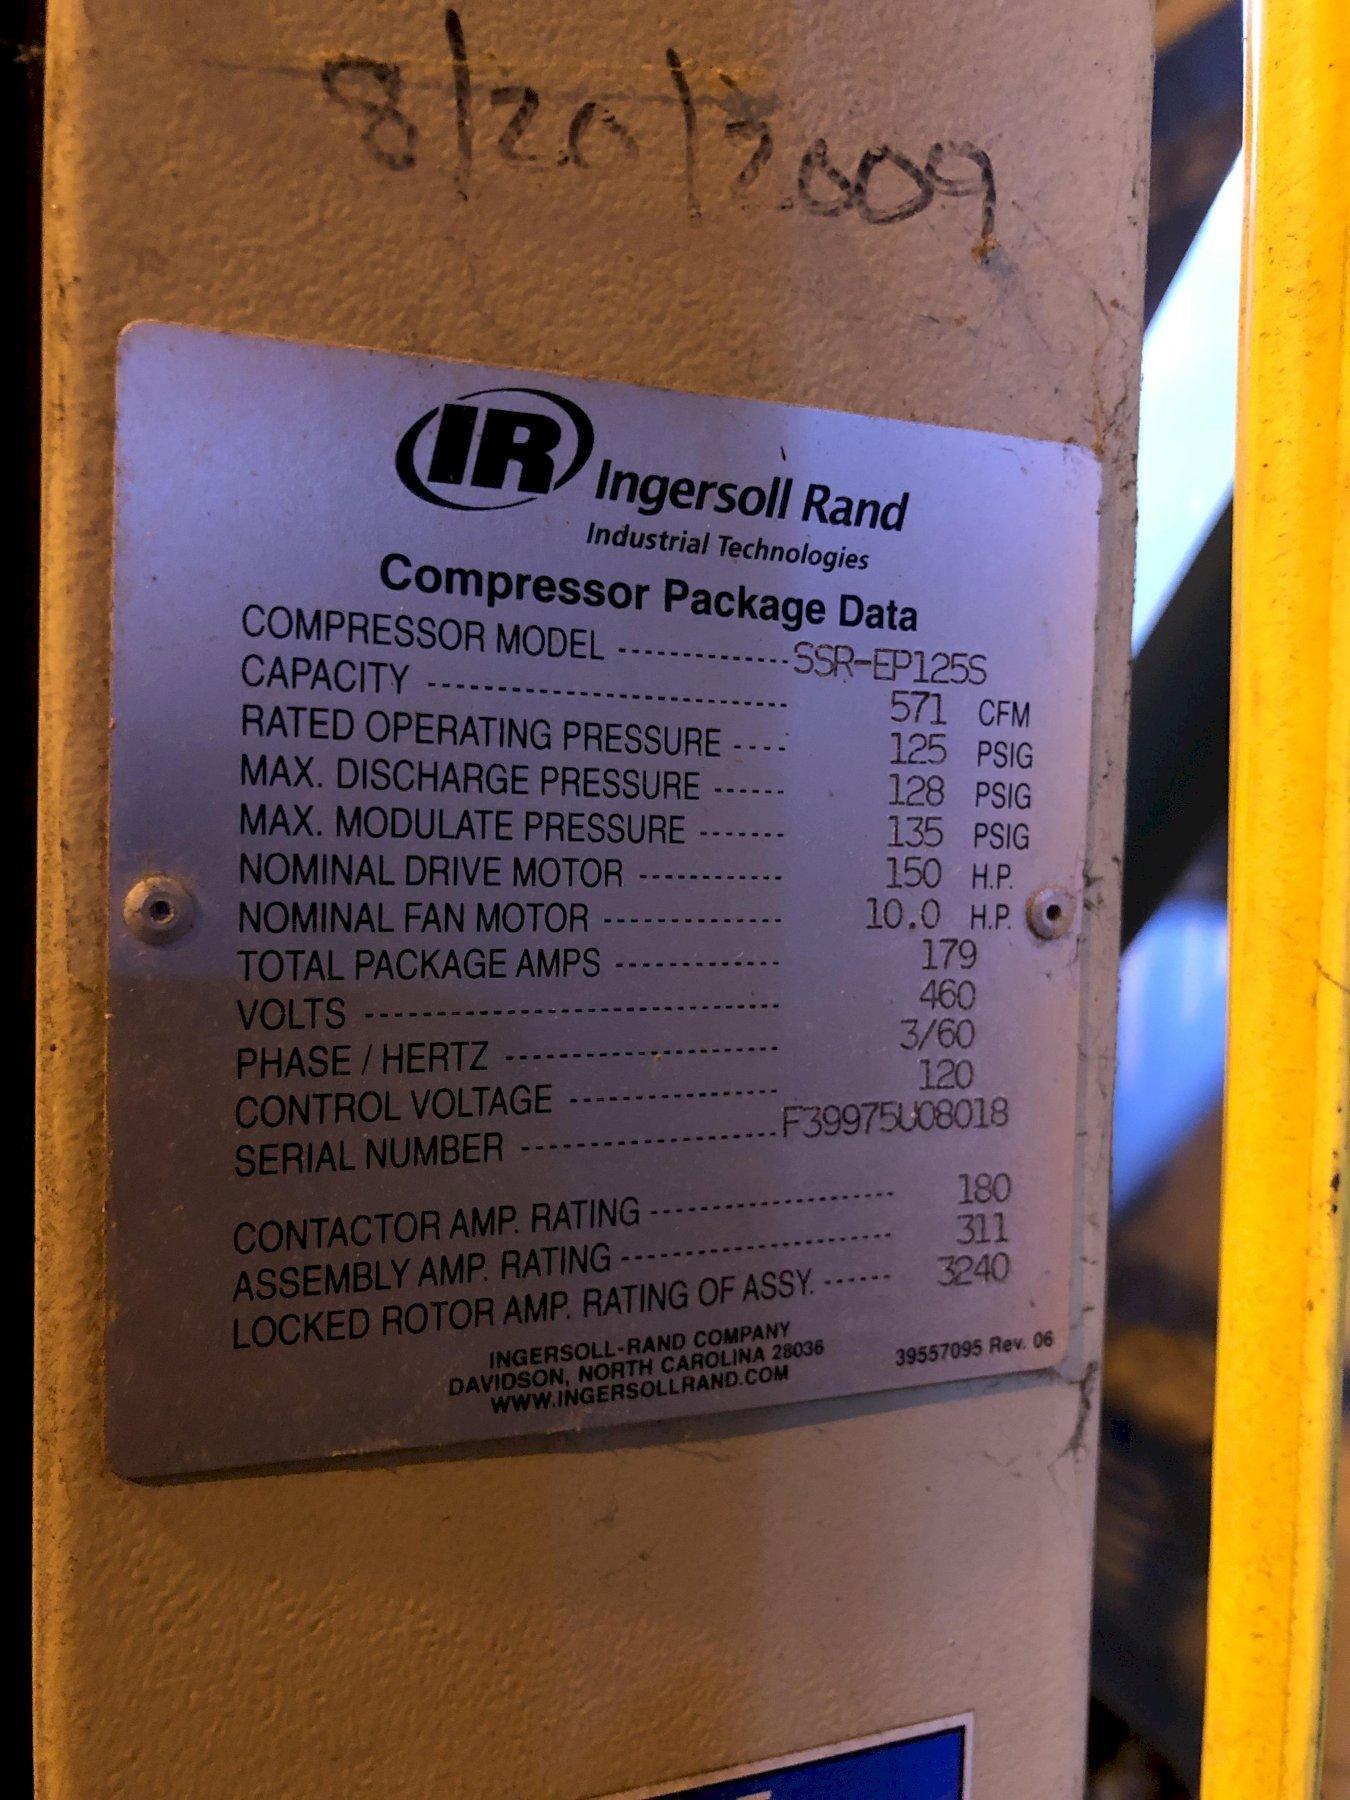 2008 Ingersol Rand model ssr-ep125s screw type air compressor s/n f39975u08018, 125 hp, digital readout